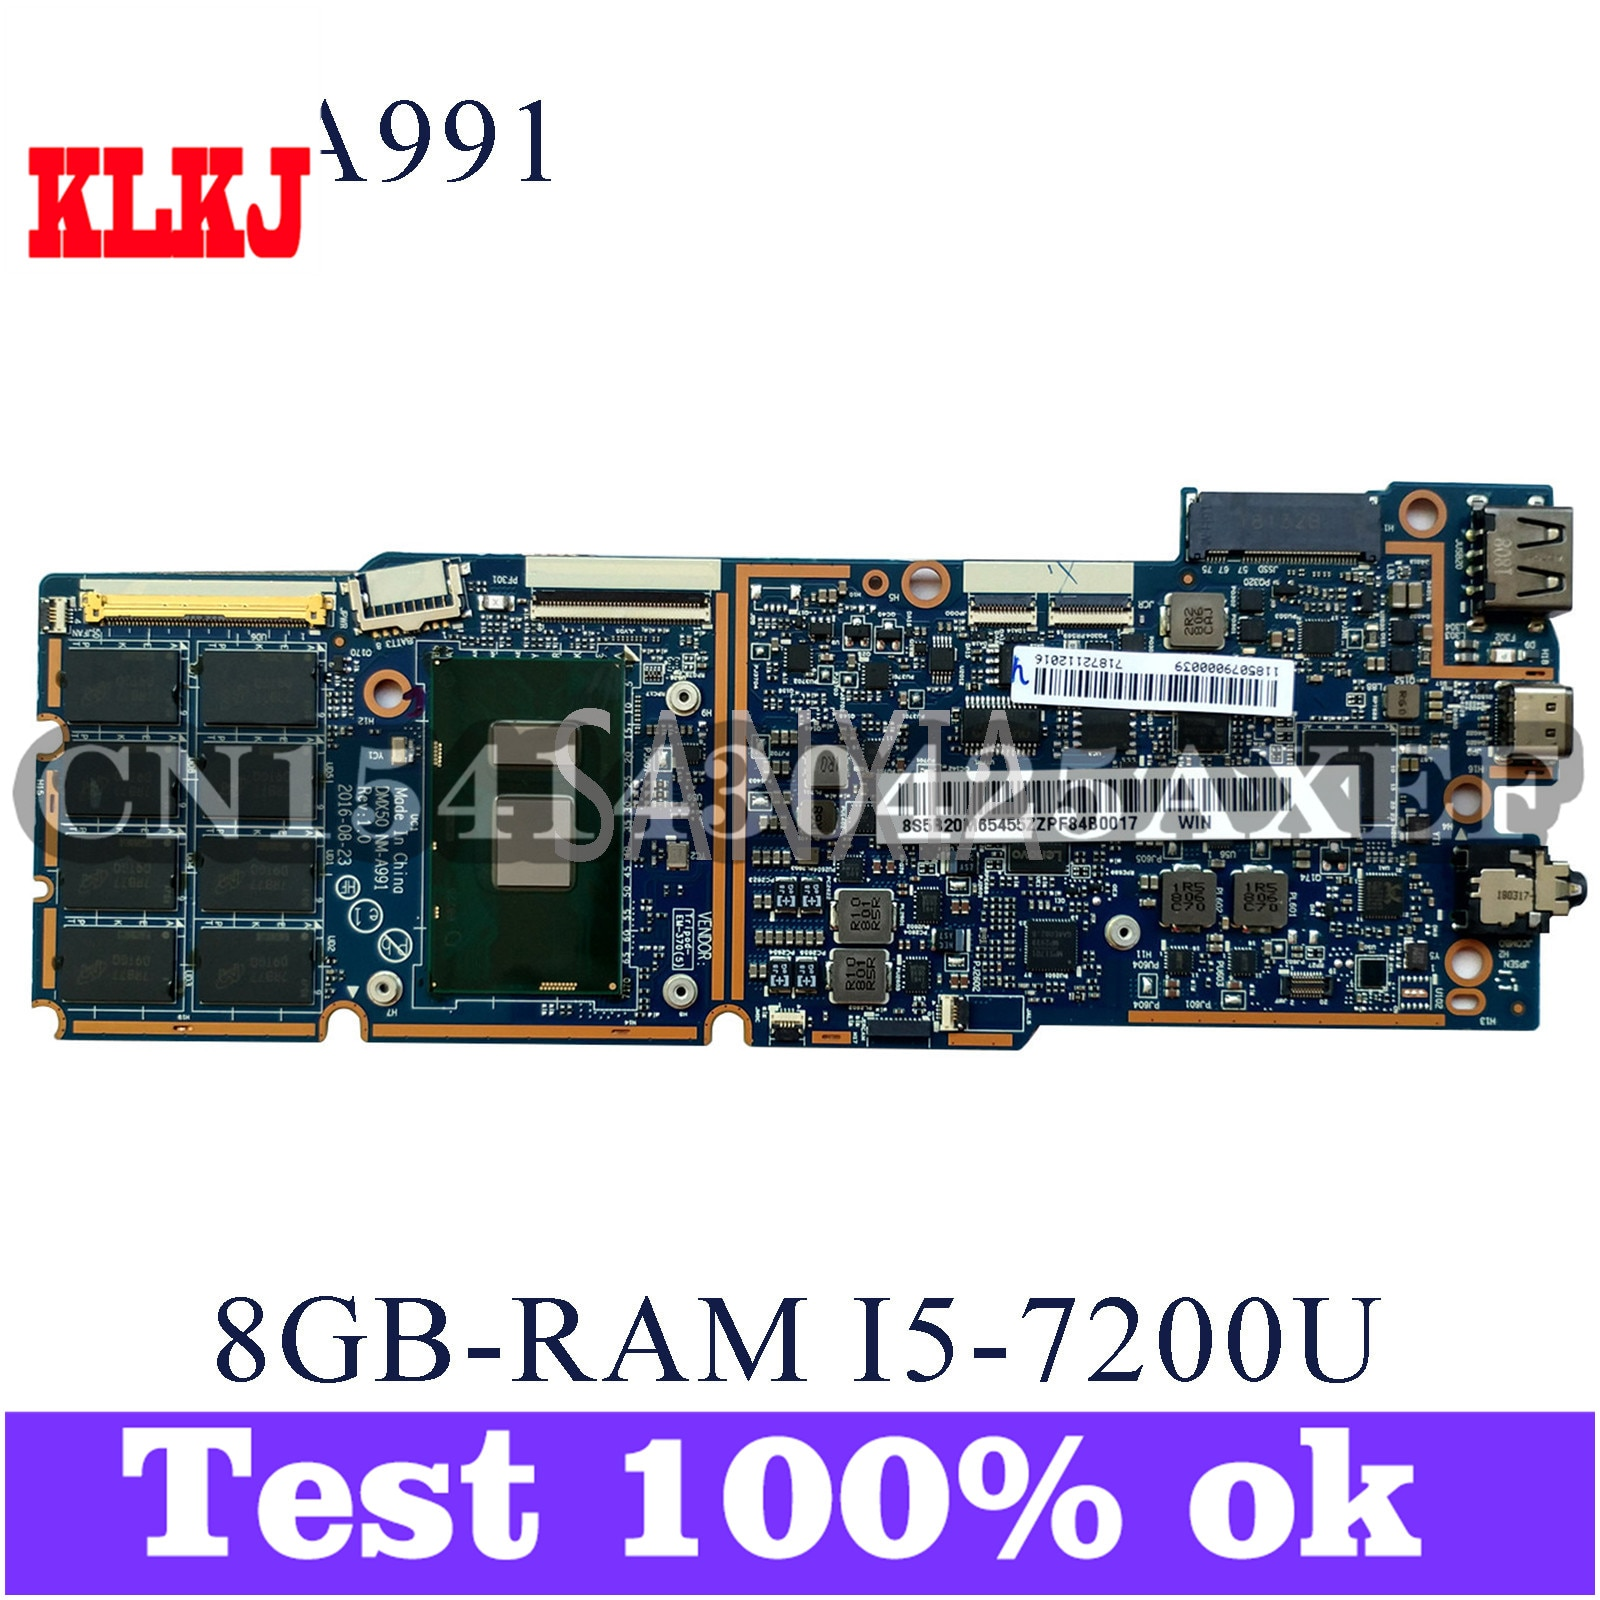 KLKJ NM-A991 اللوحة الأم لأجهزة الكمبيوتر المحمول لينوفو MIIX 720-12IKB اللوحة الرئيسية الأصلية 8G-RAM I5-7200U